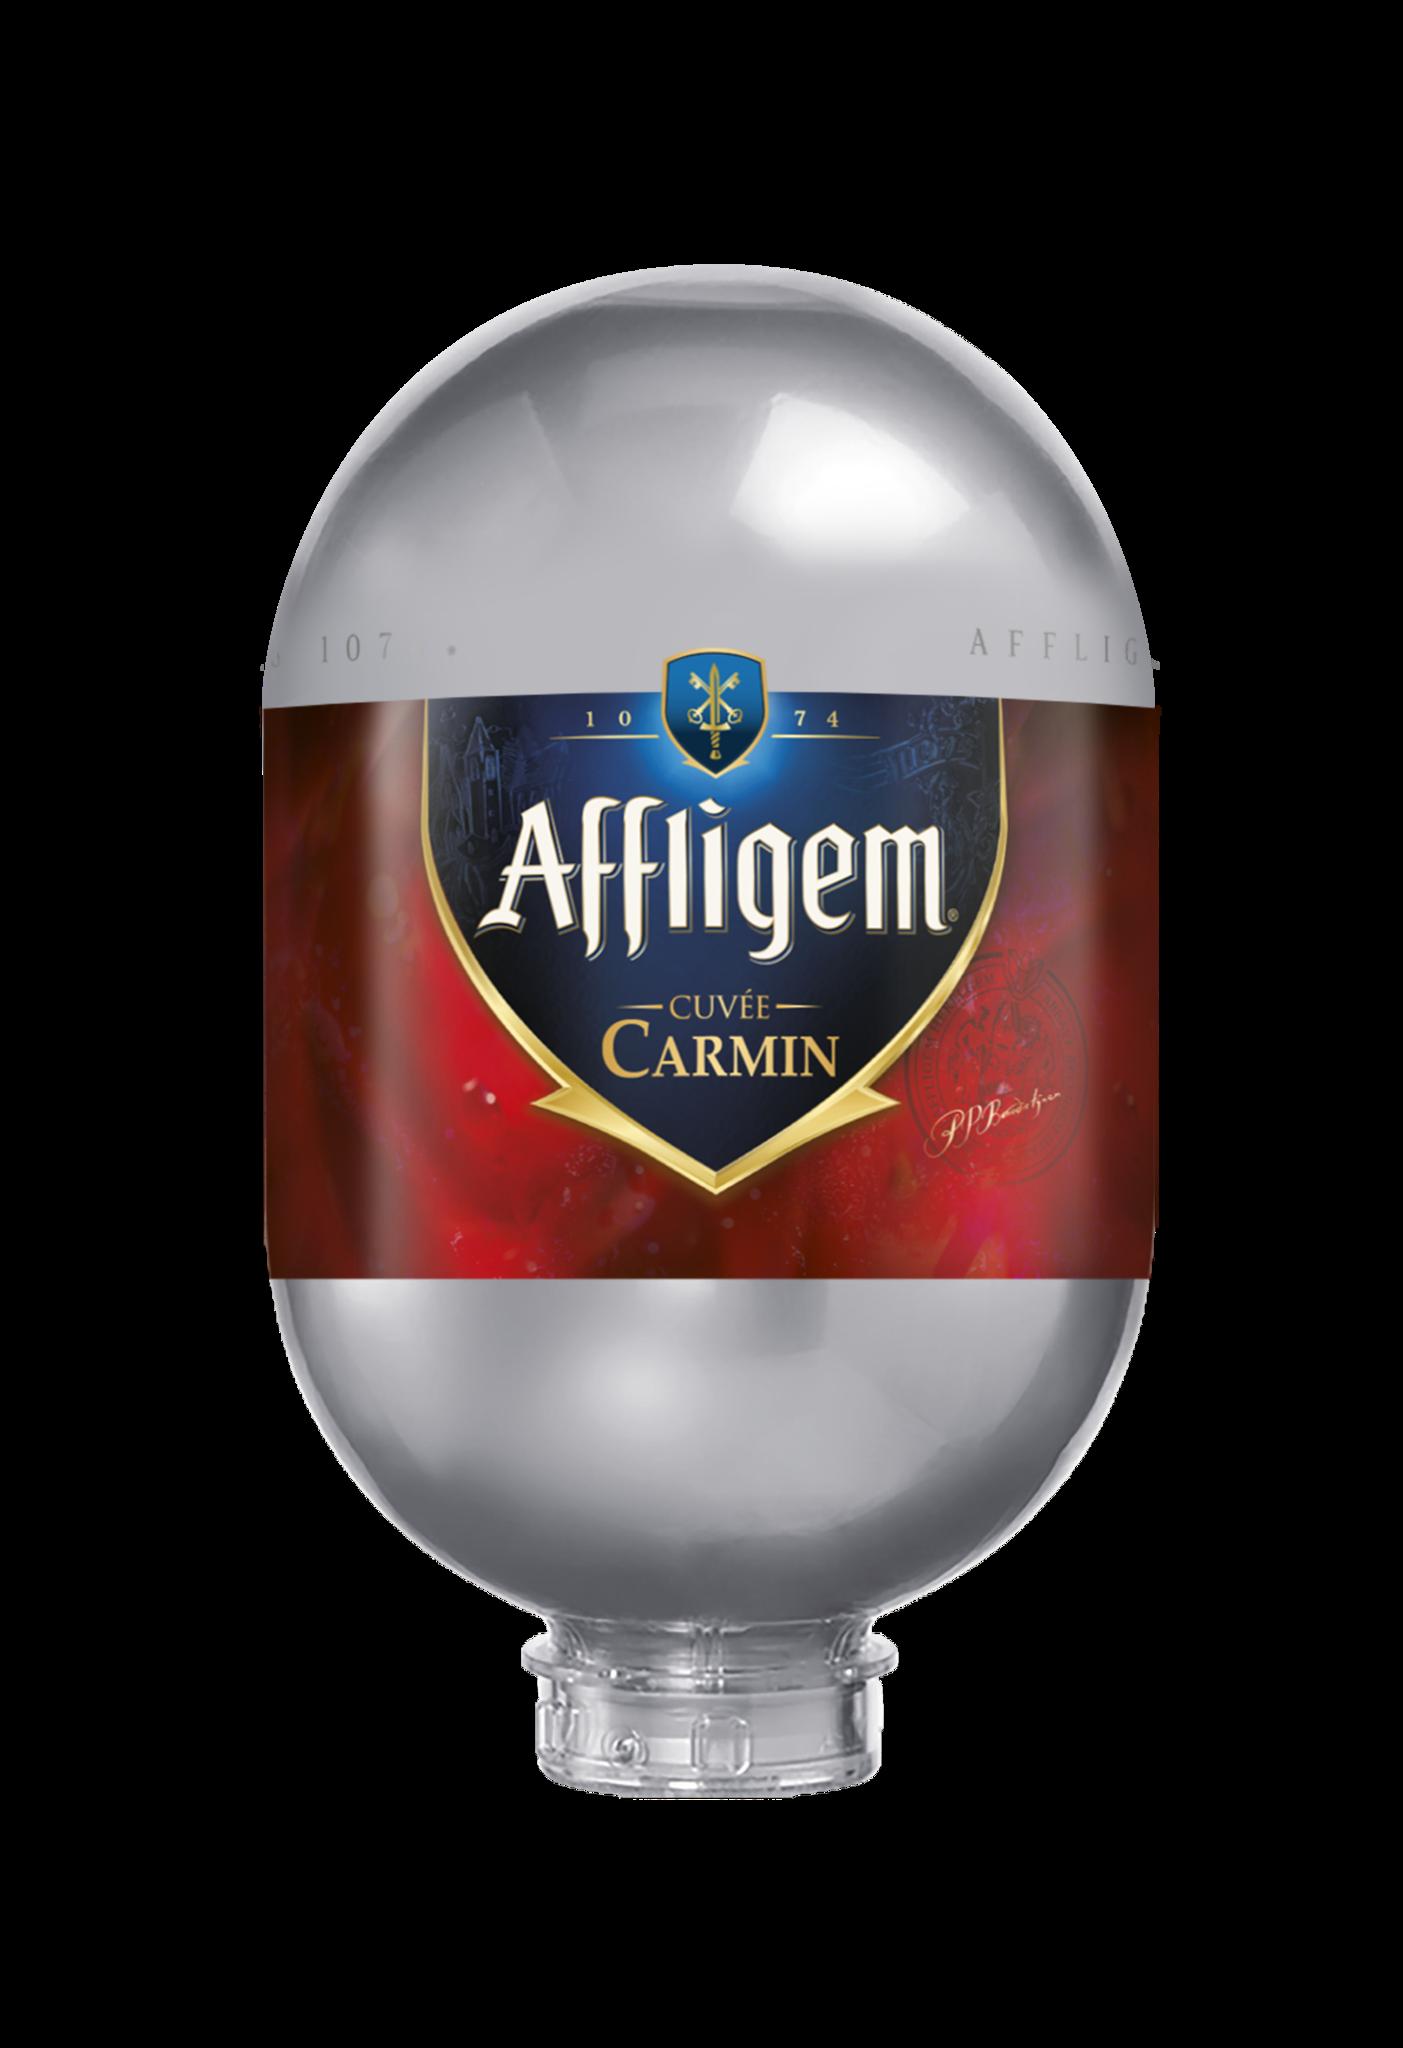 Affligem Cuvee Carmin 8L